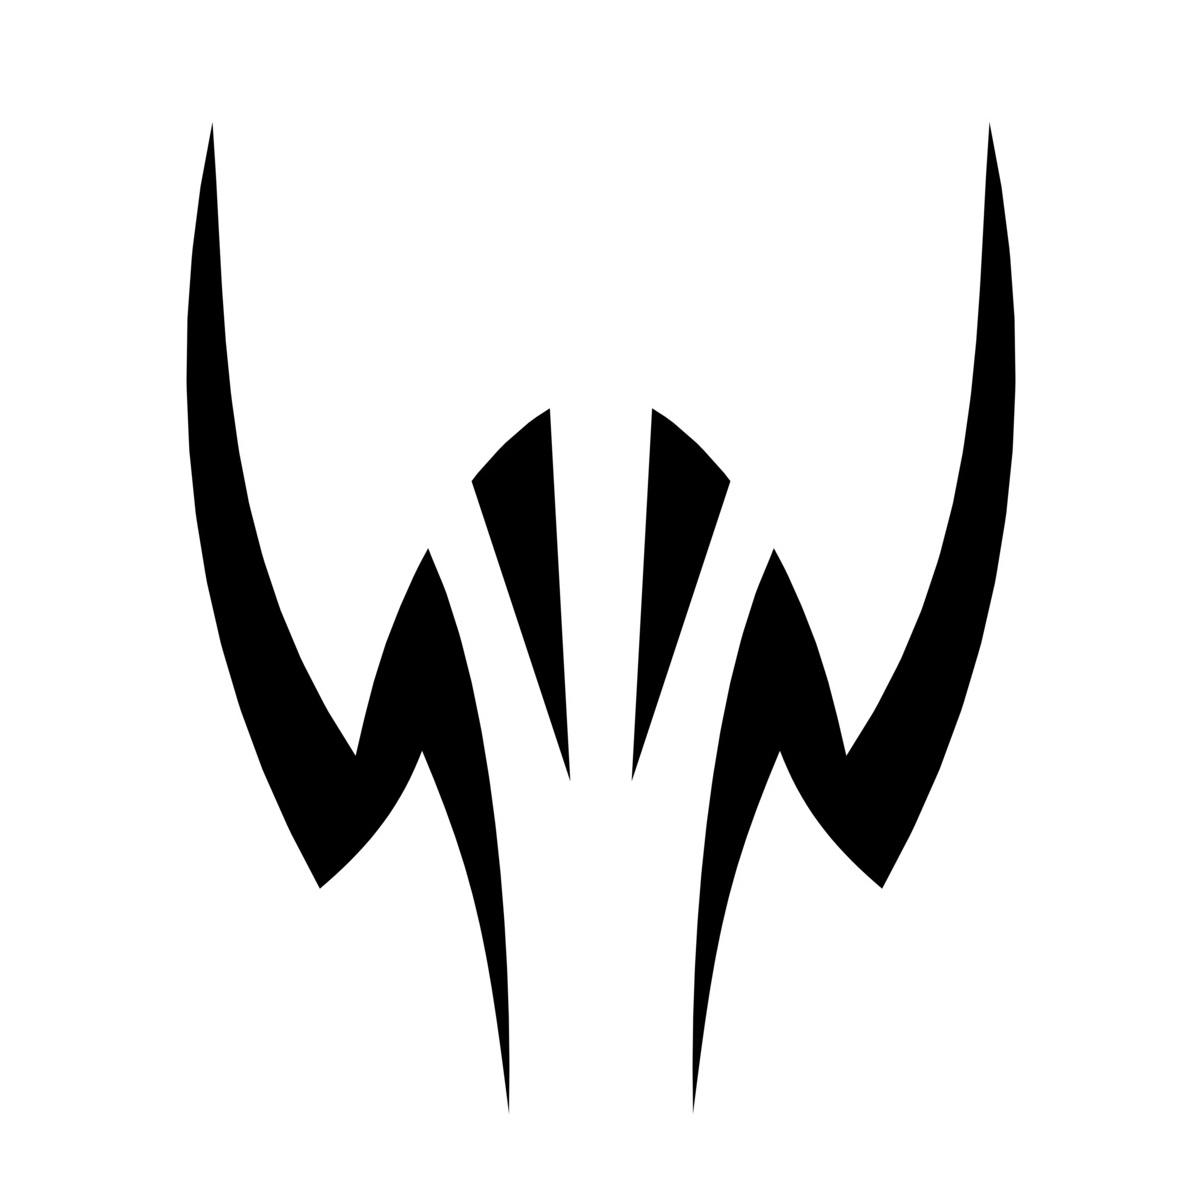 Brotherhood Of Darkness Star Wars Villains Wiki Fandom Powered